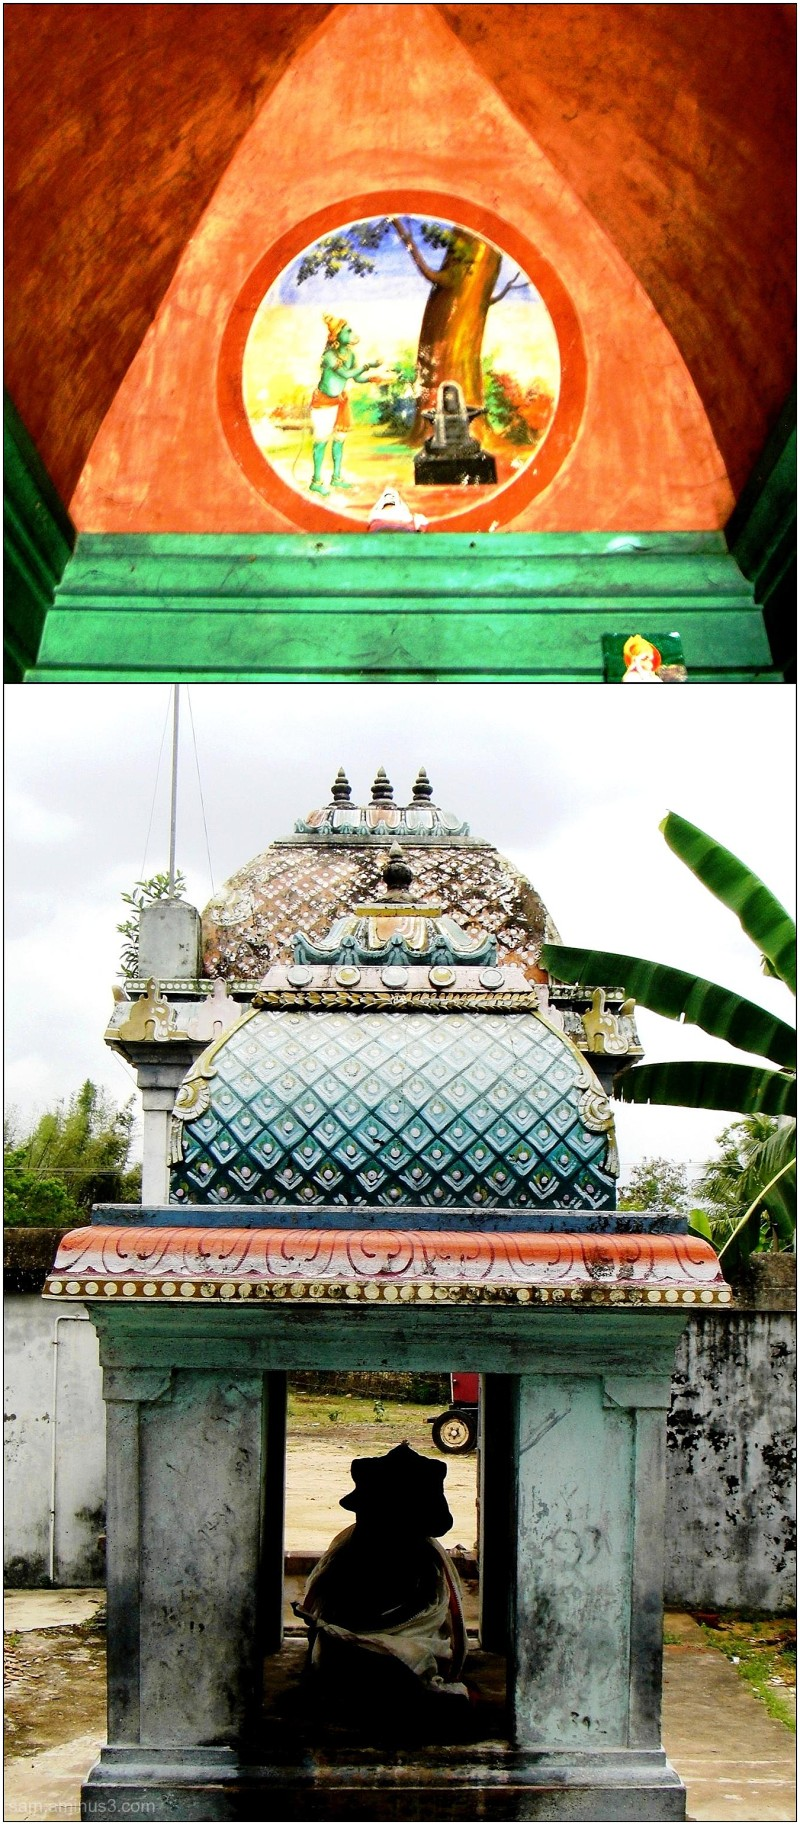 Thirukurakka Temple